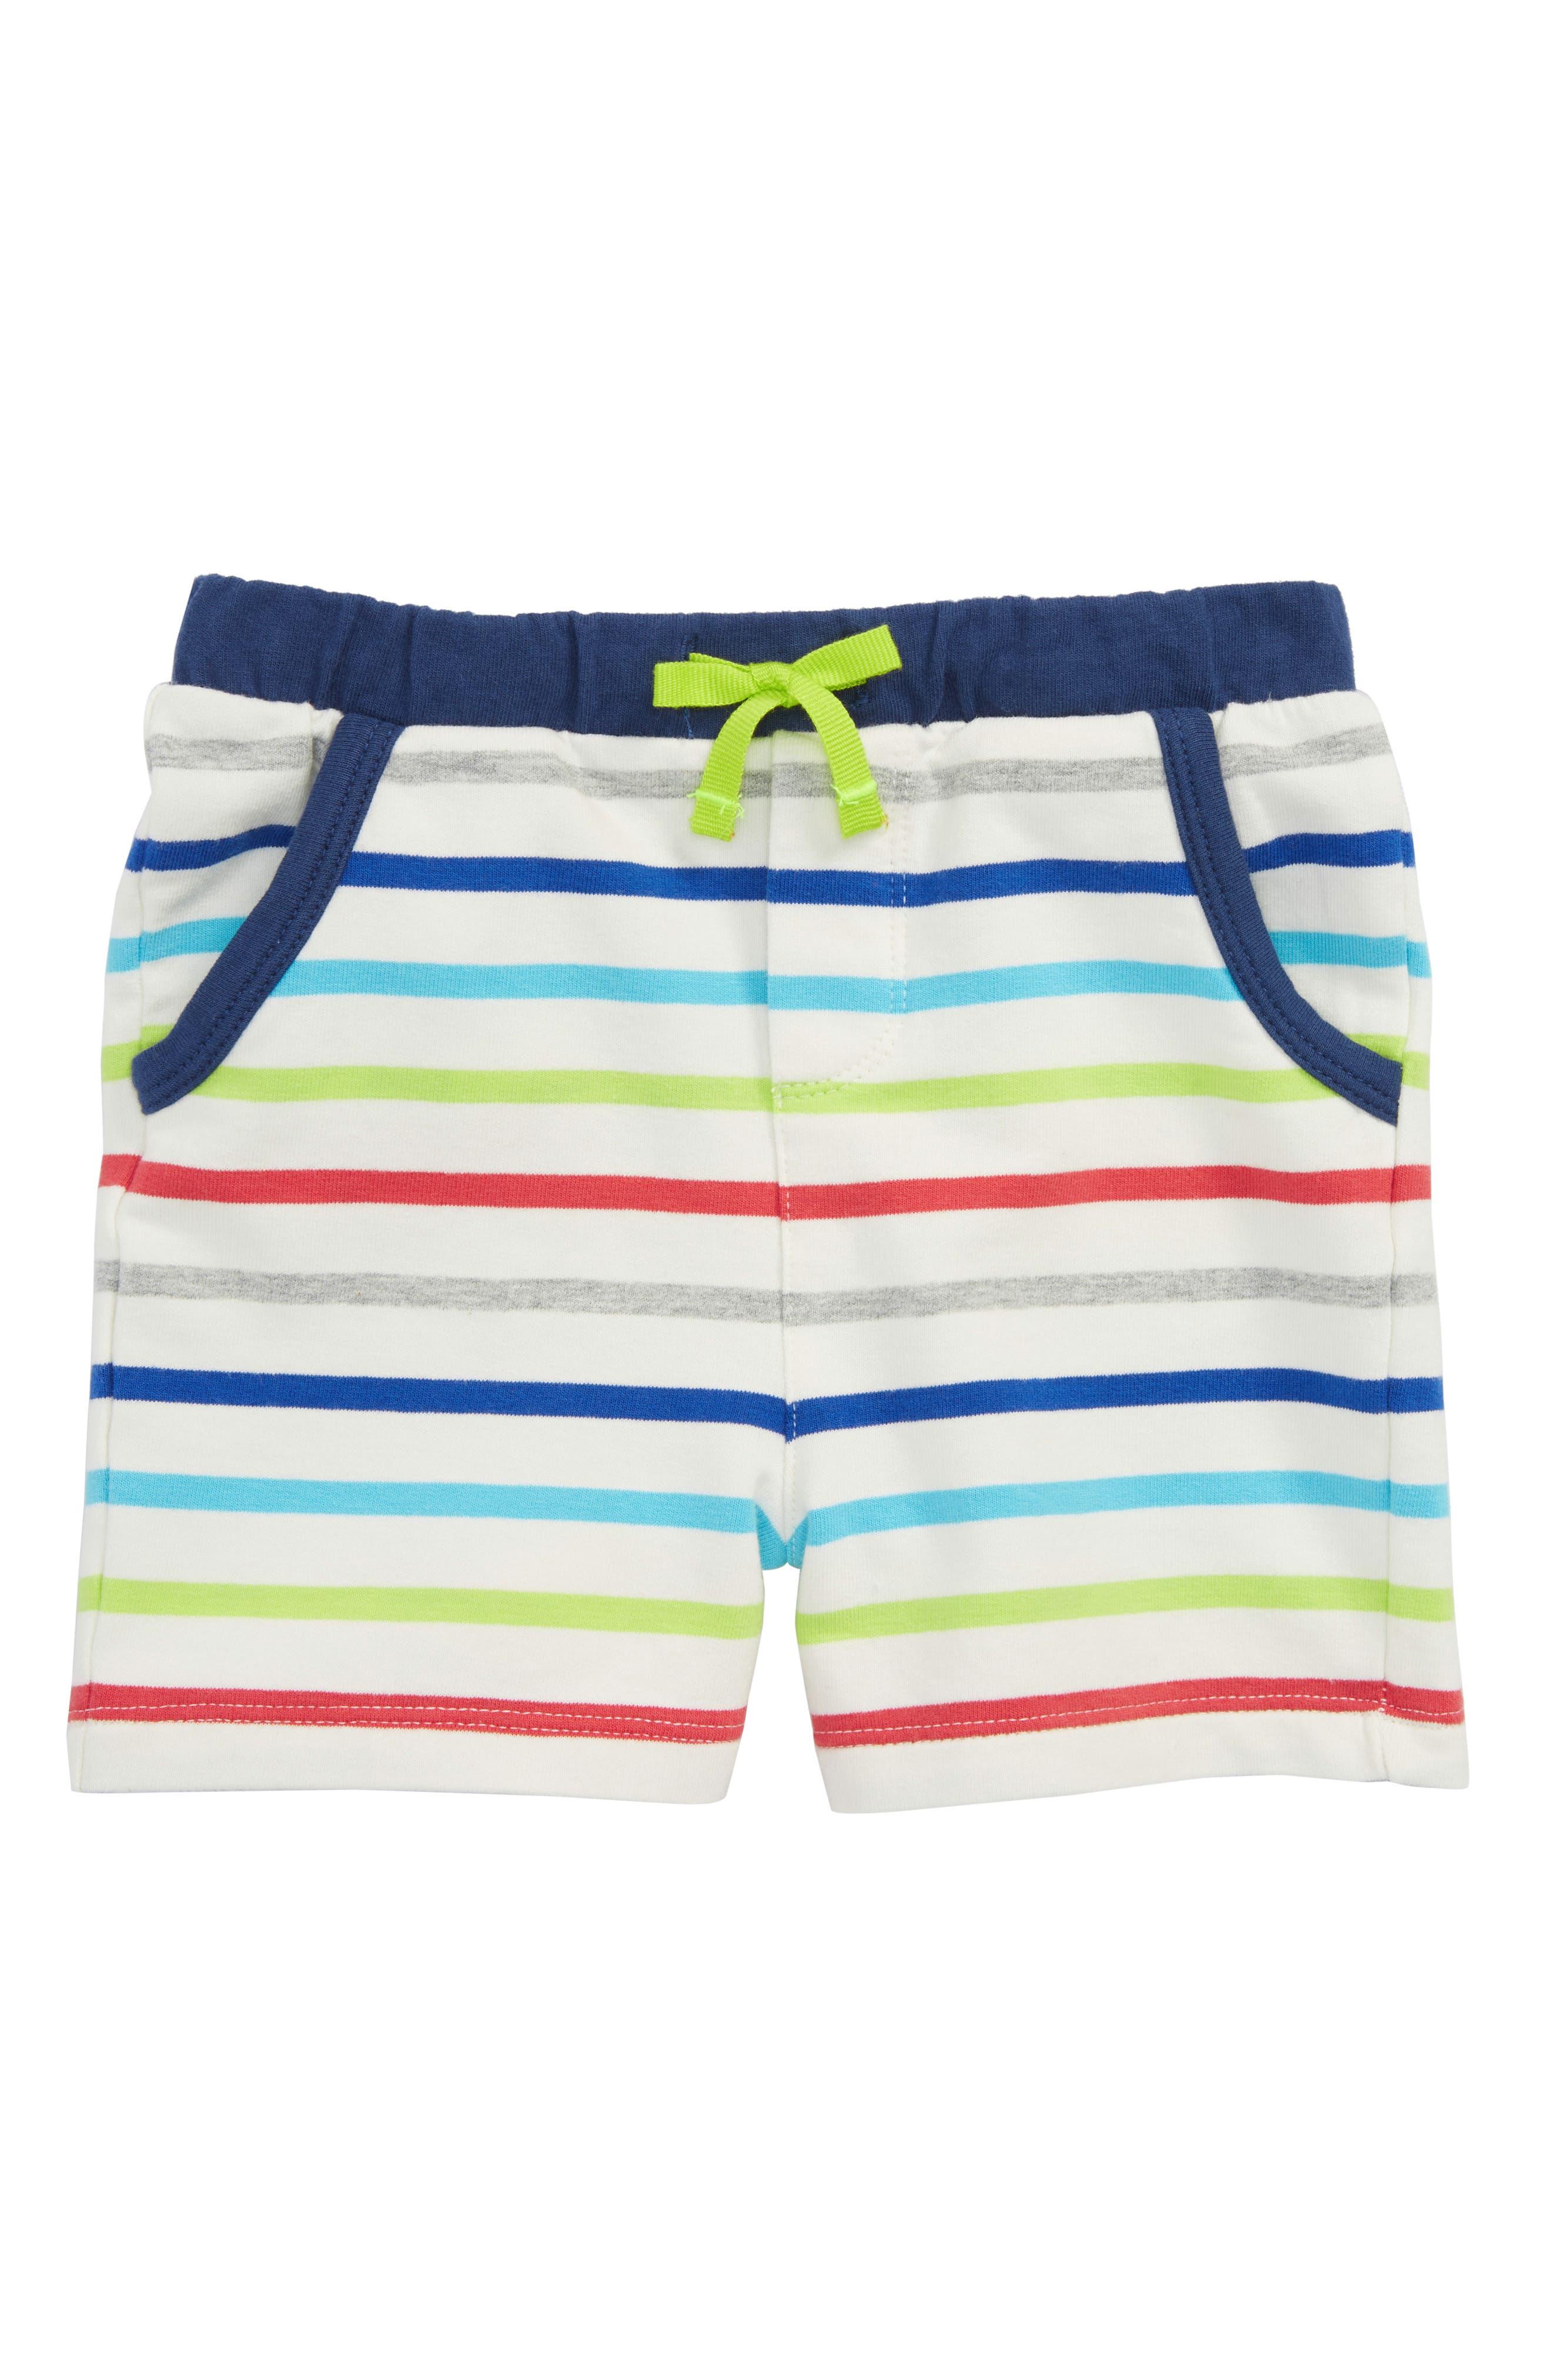 Jersey Shorts,                             Main thumbnail 1, color,                             Fun Stripe